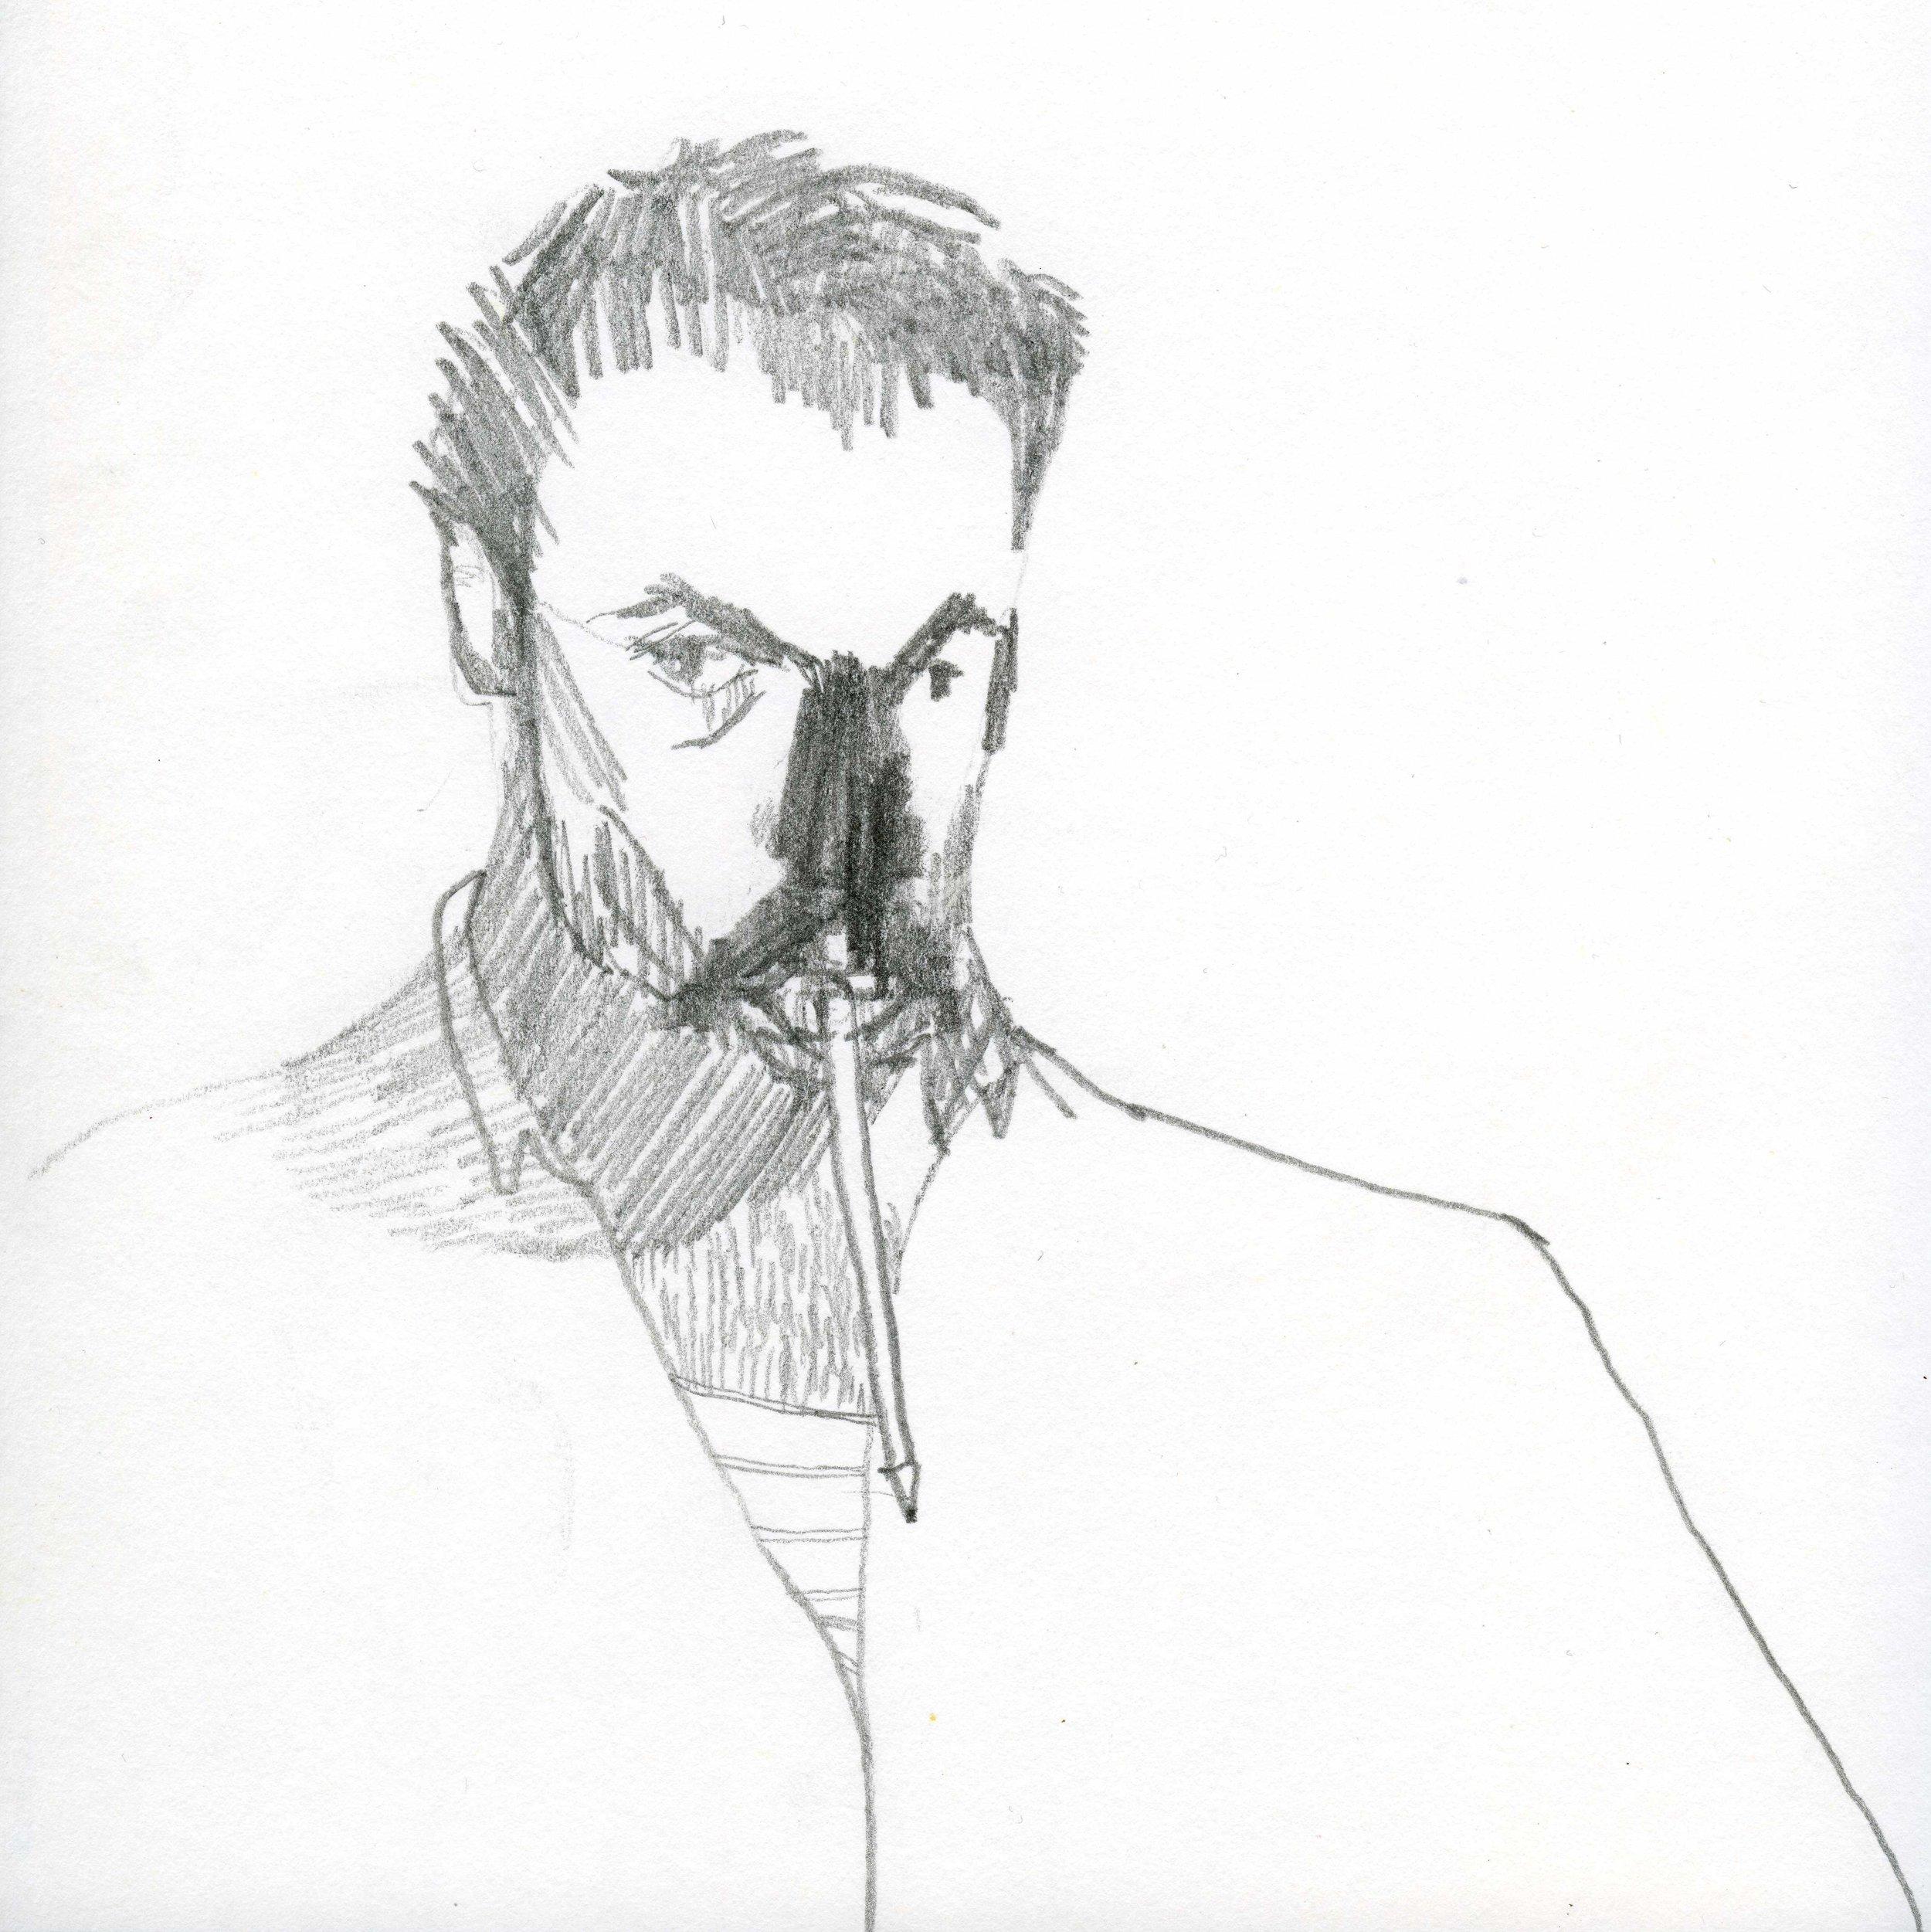 Self Portrait with a pencil  on paper 20 X 20 cm